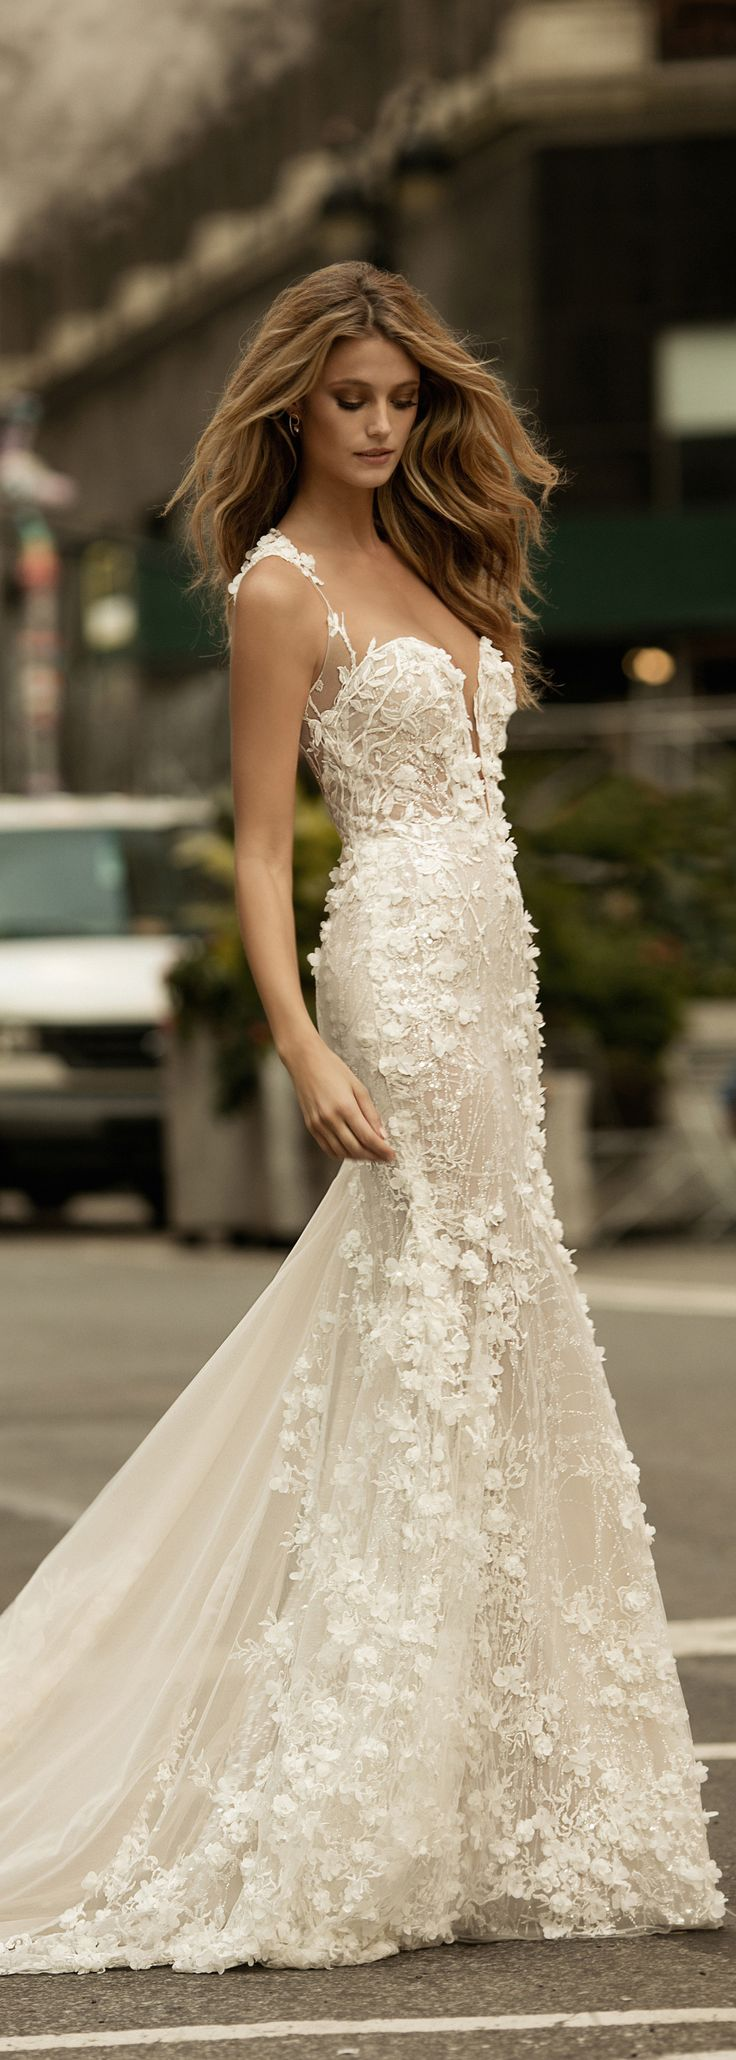 Hermoso vestido... ❤❤❤❤❤